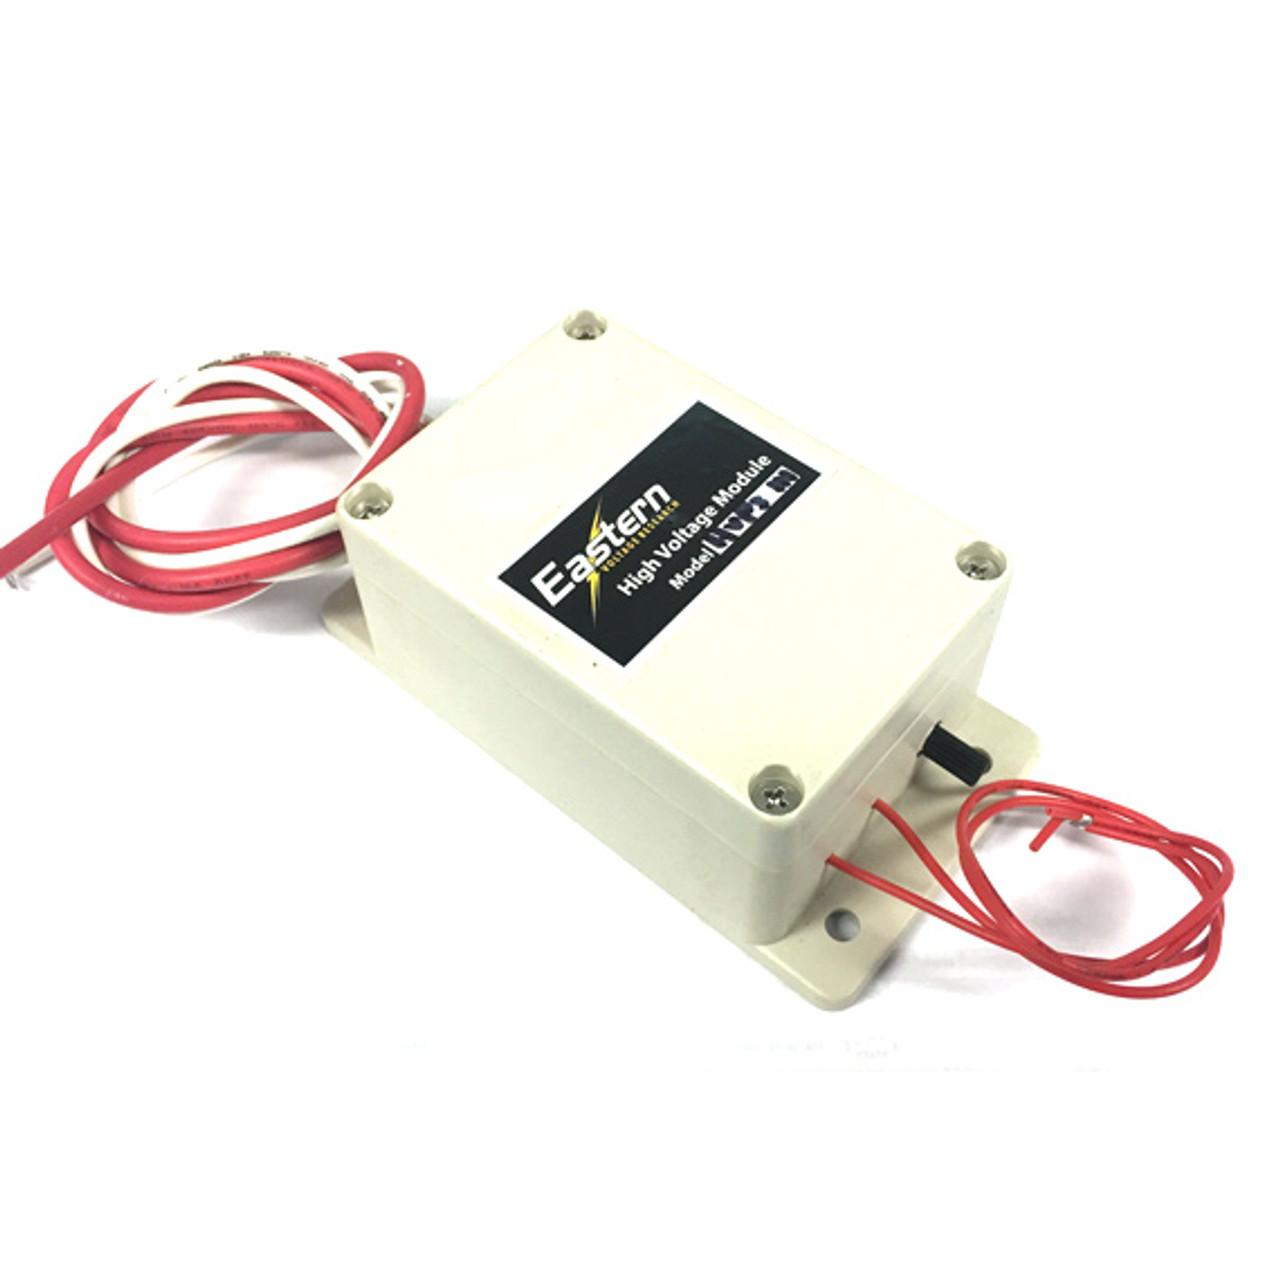 HVPS3 - 10kV High Voltage Power Supply